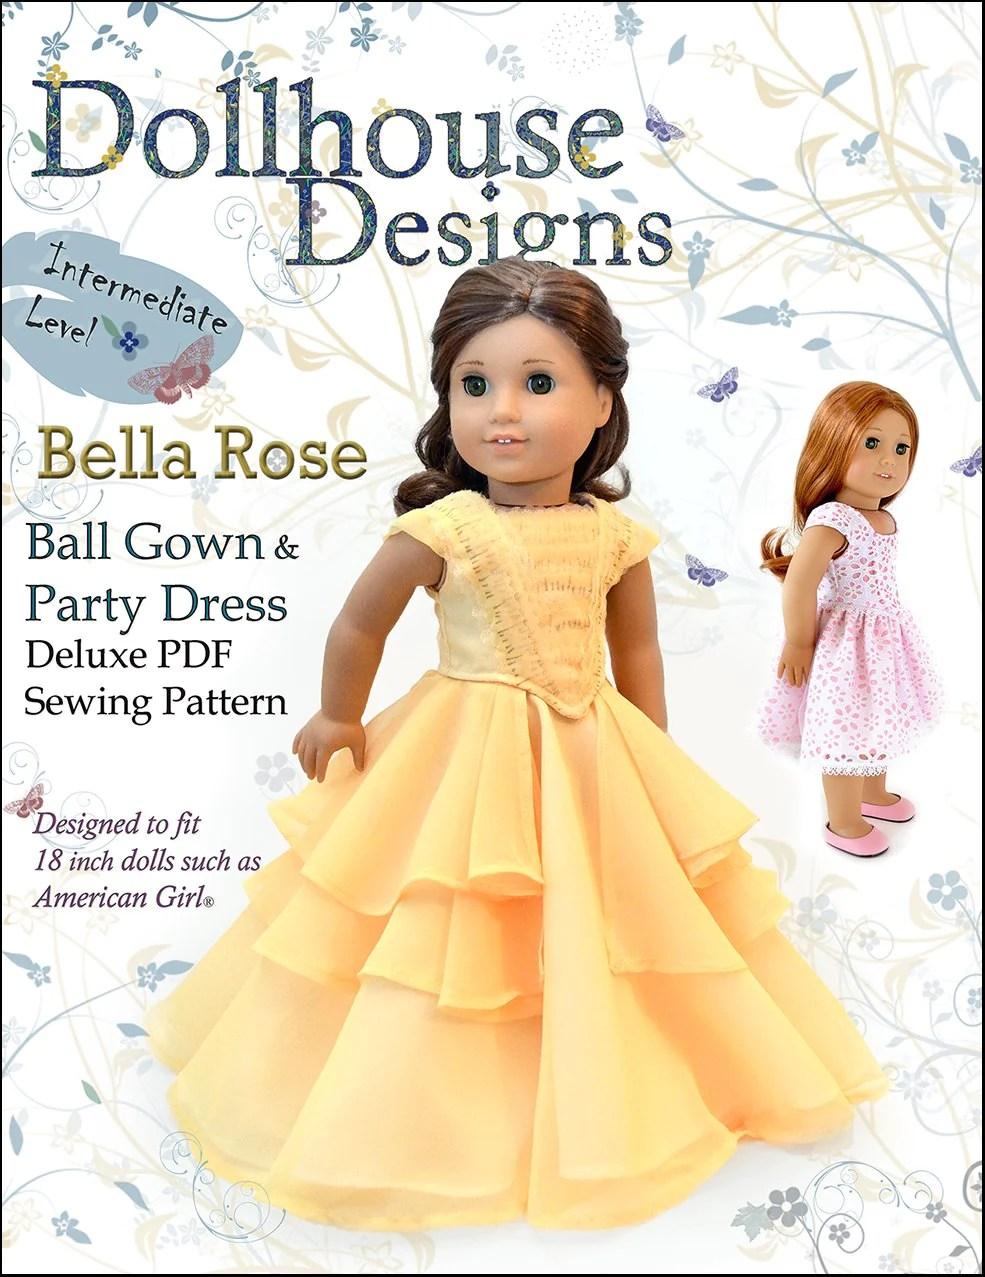 18 Inch Doll Dress Patterns : dress, patterns, Dollhouse, Designs, Bella, Dress, Clothes, Pattern, Dolls, Pixie, Faire